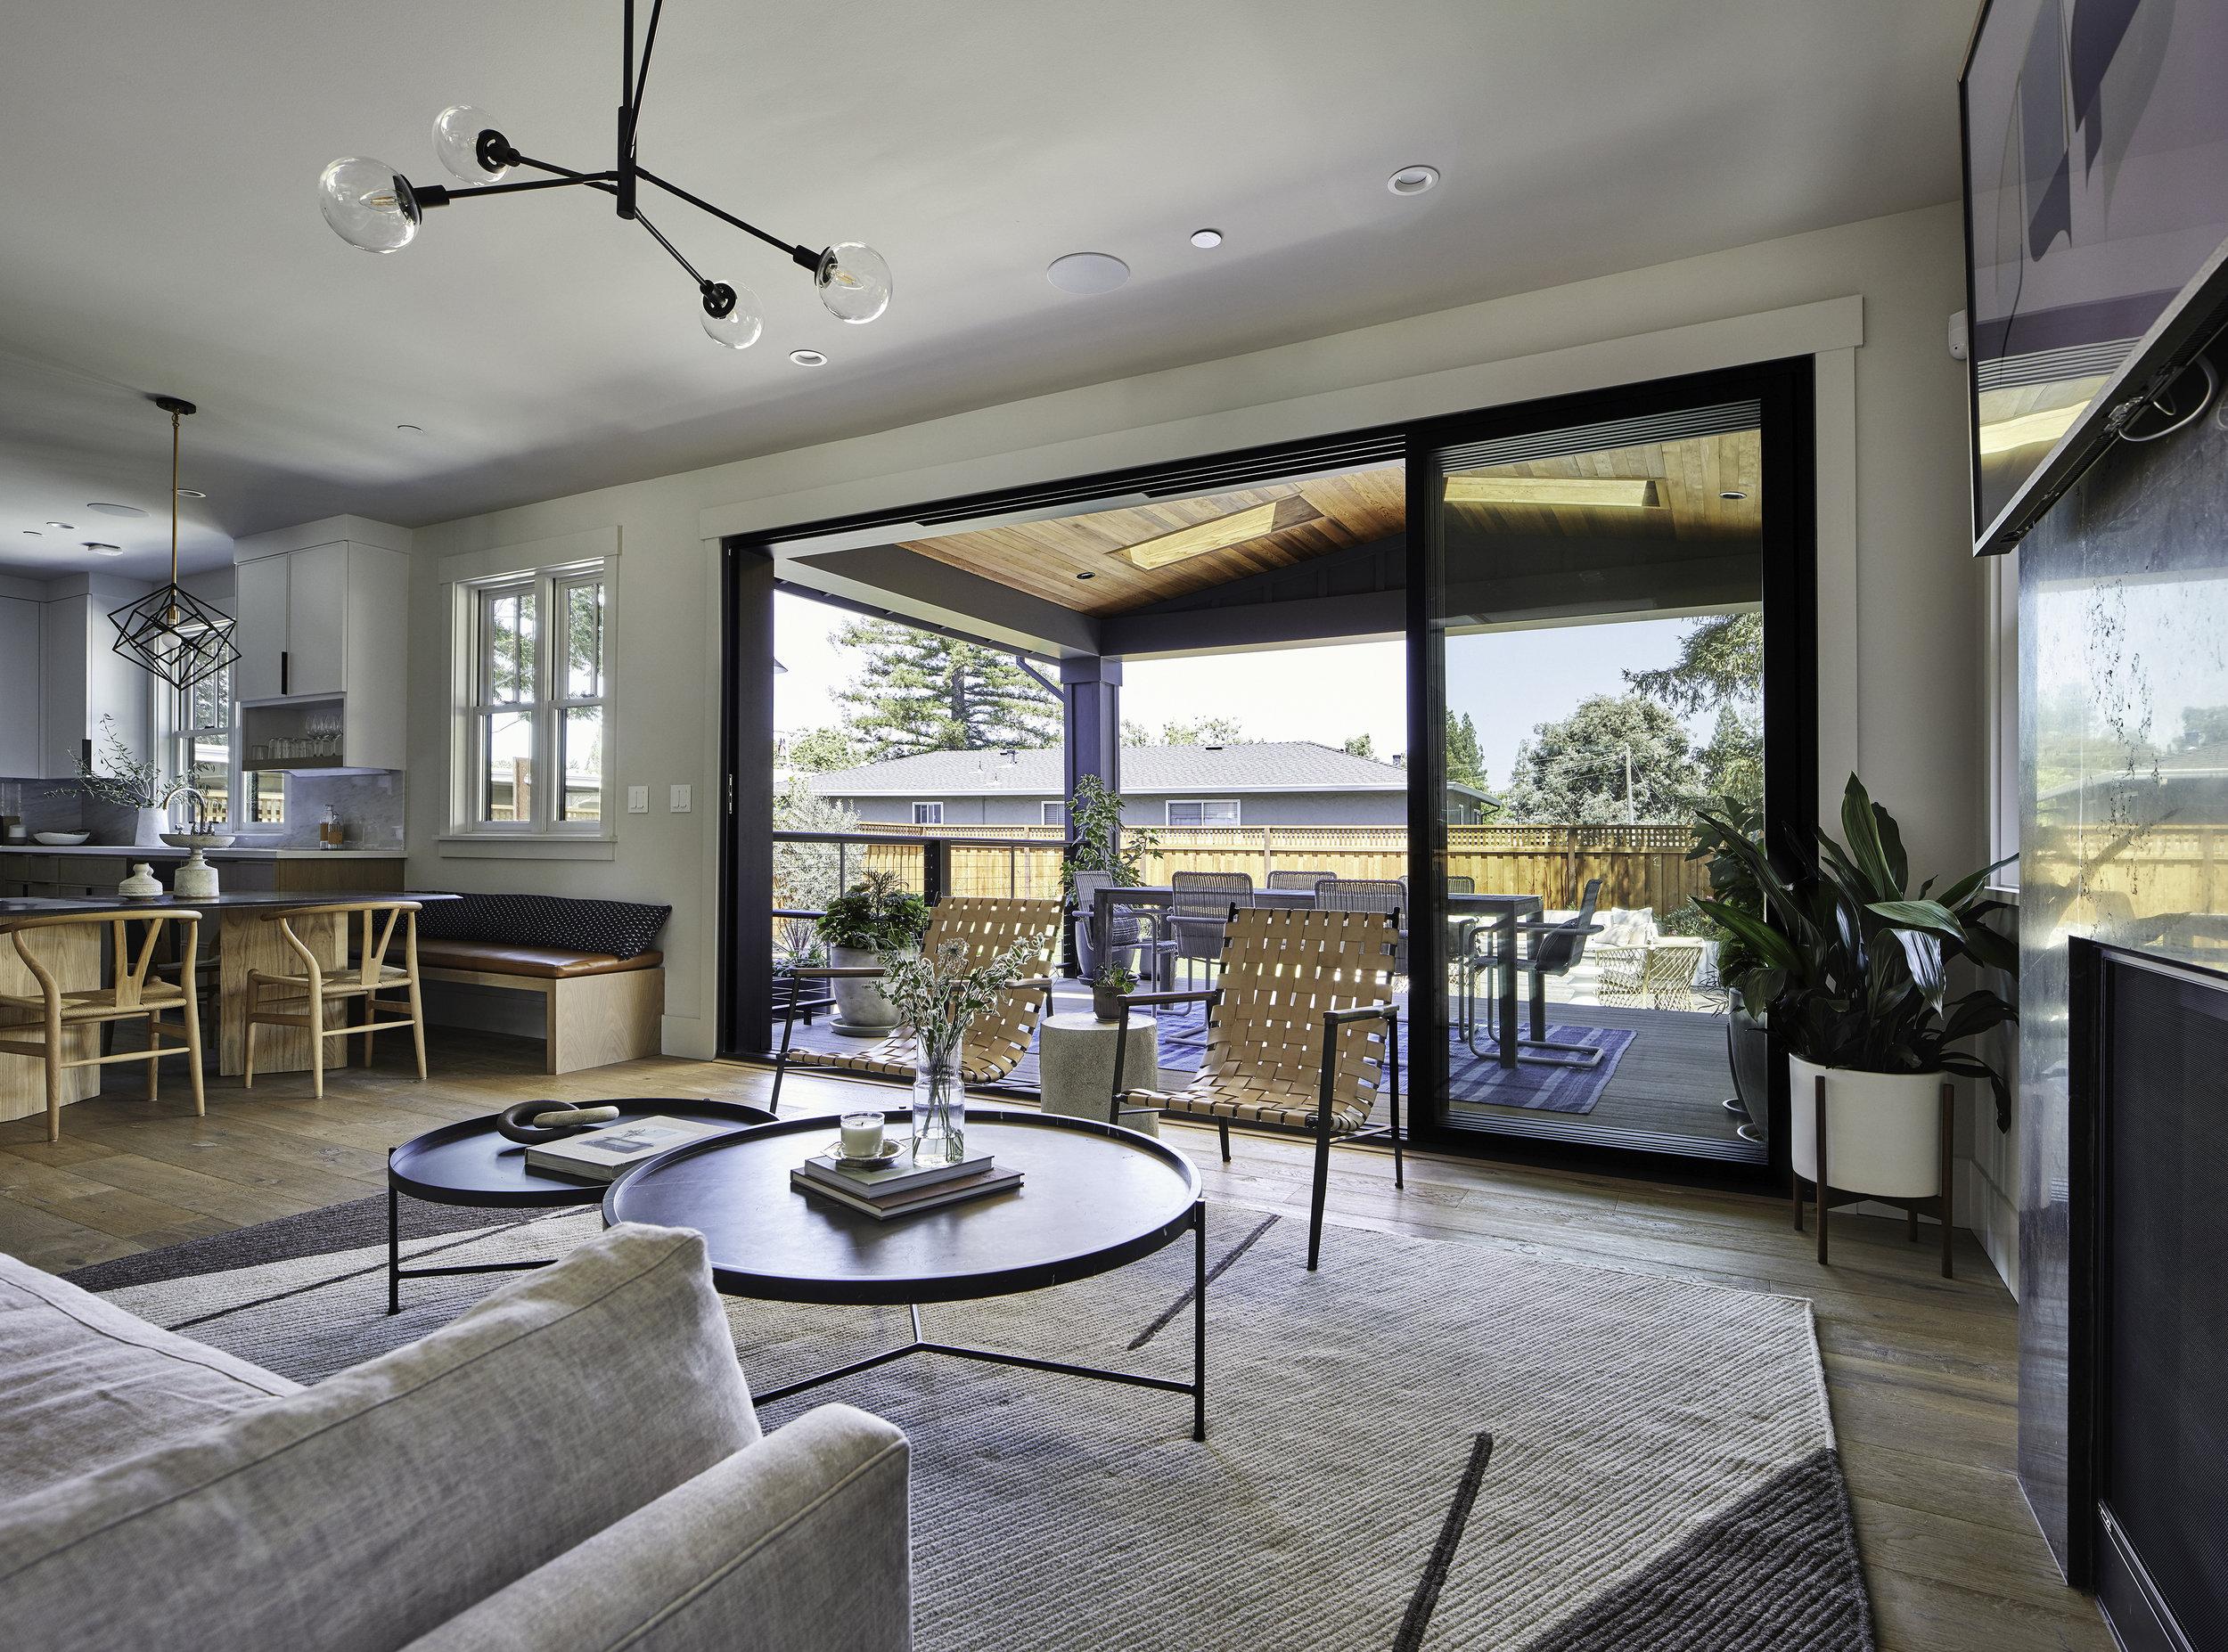 velux_rustywilliams_california_porch_livingroom.jpg